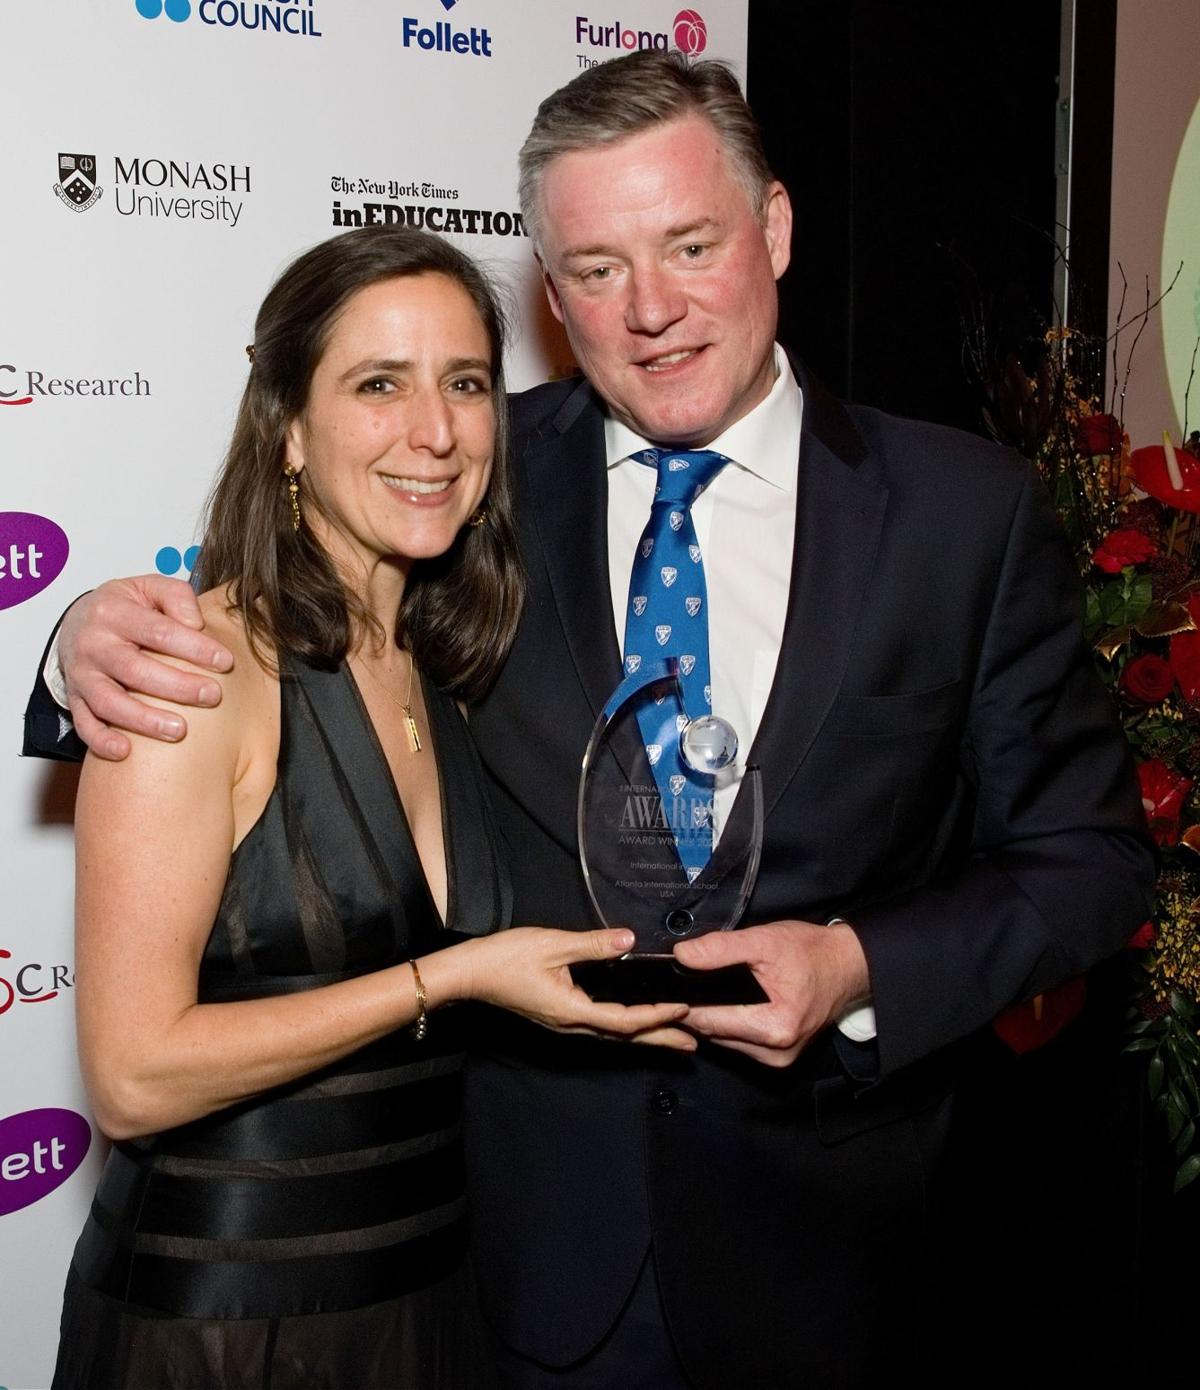 021920_MNS_full_AIS_awards_001 Kevin Glass Veronica McDaniel